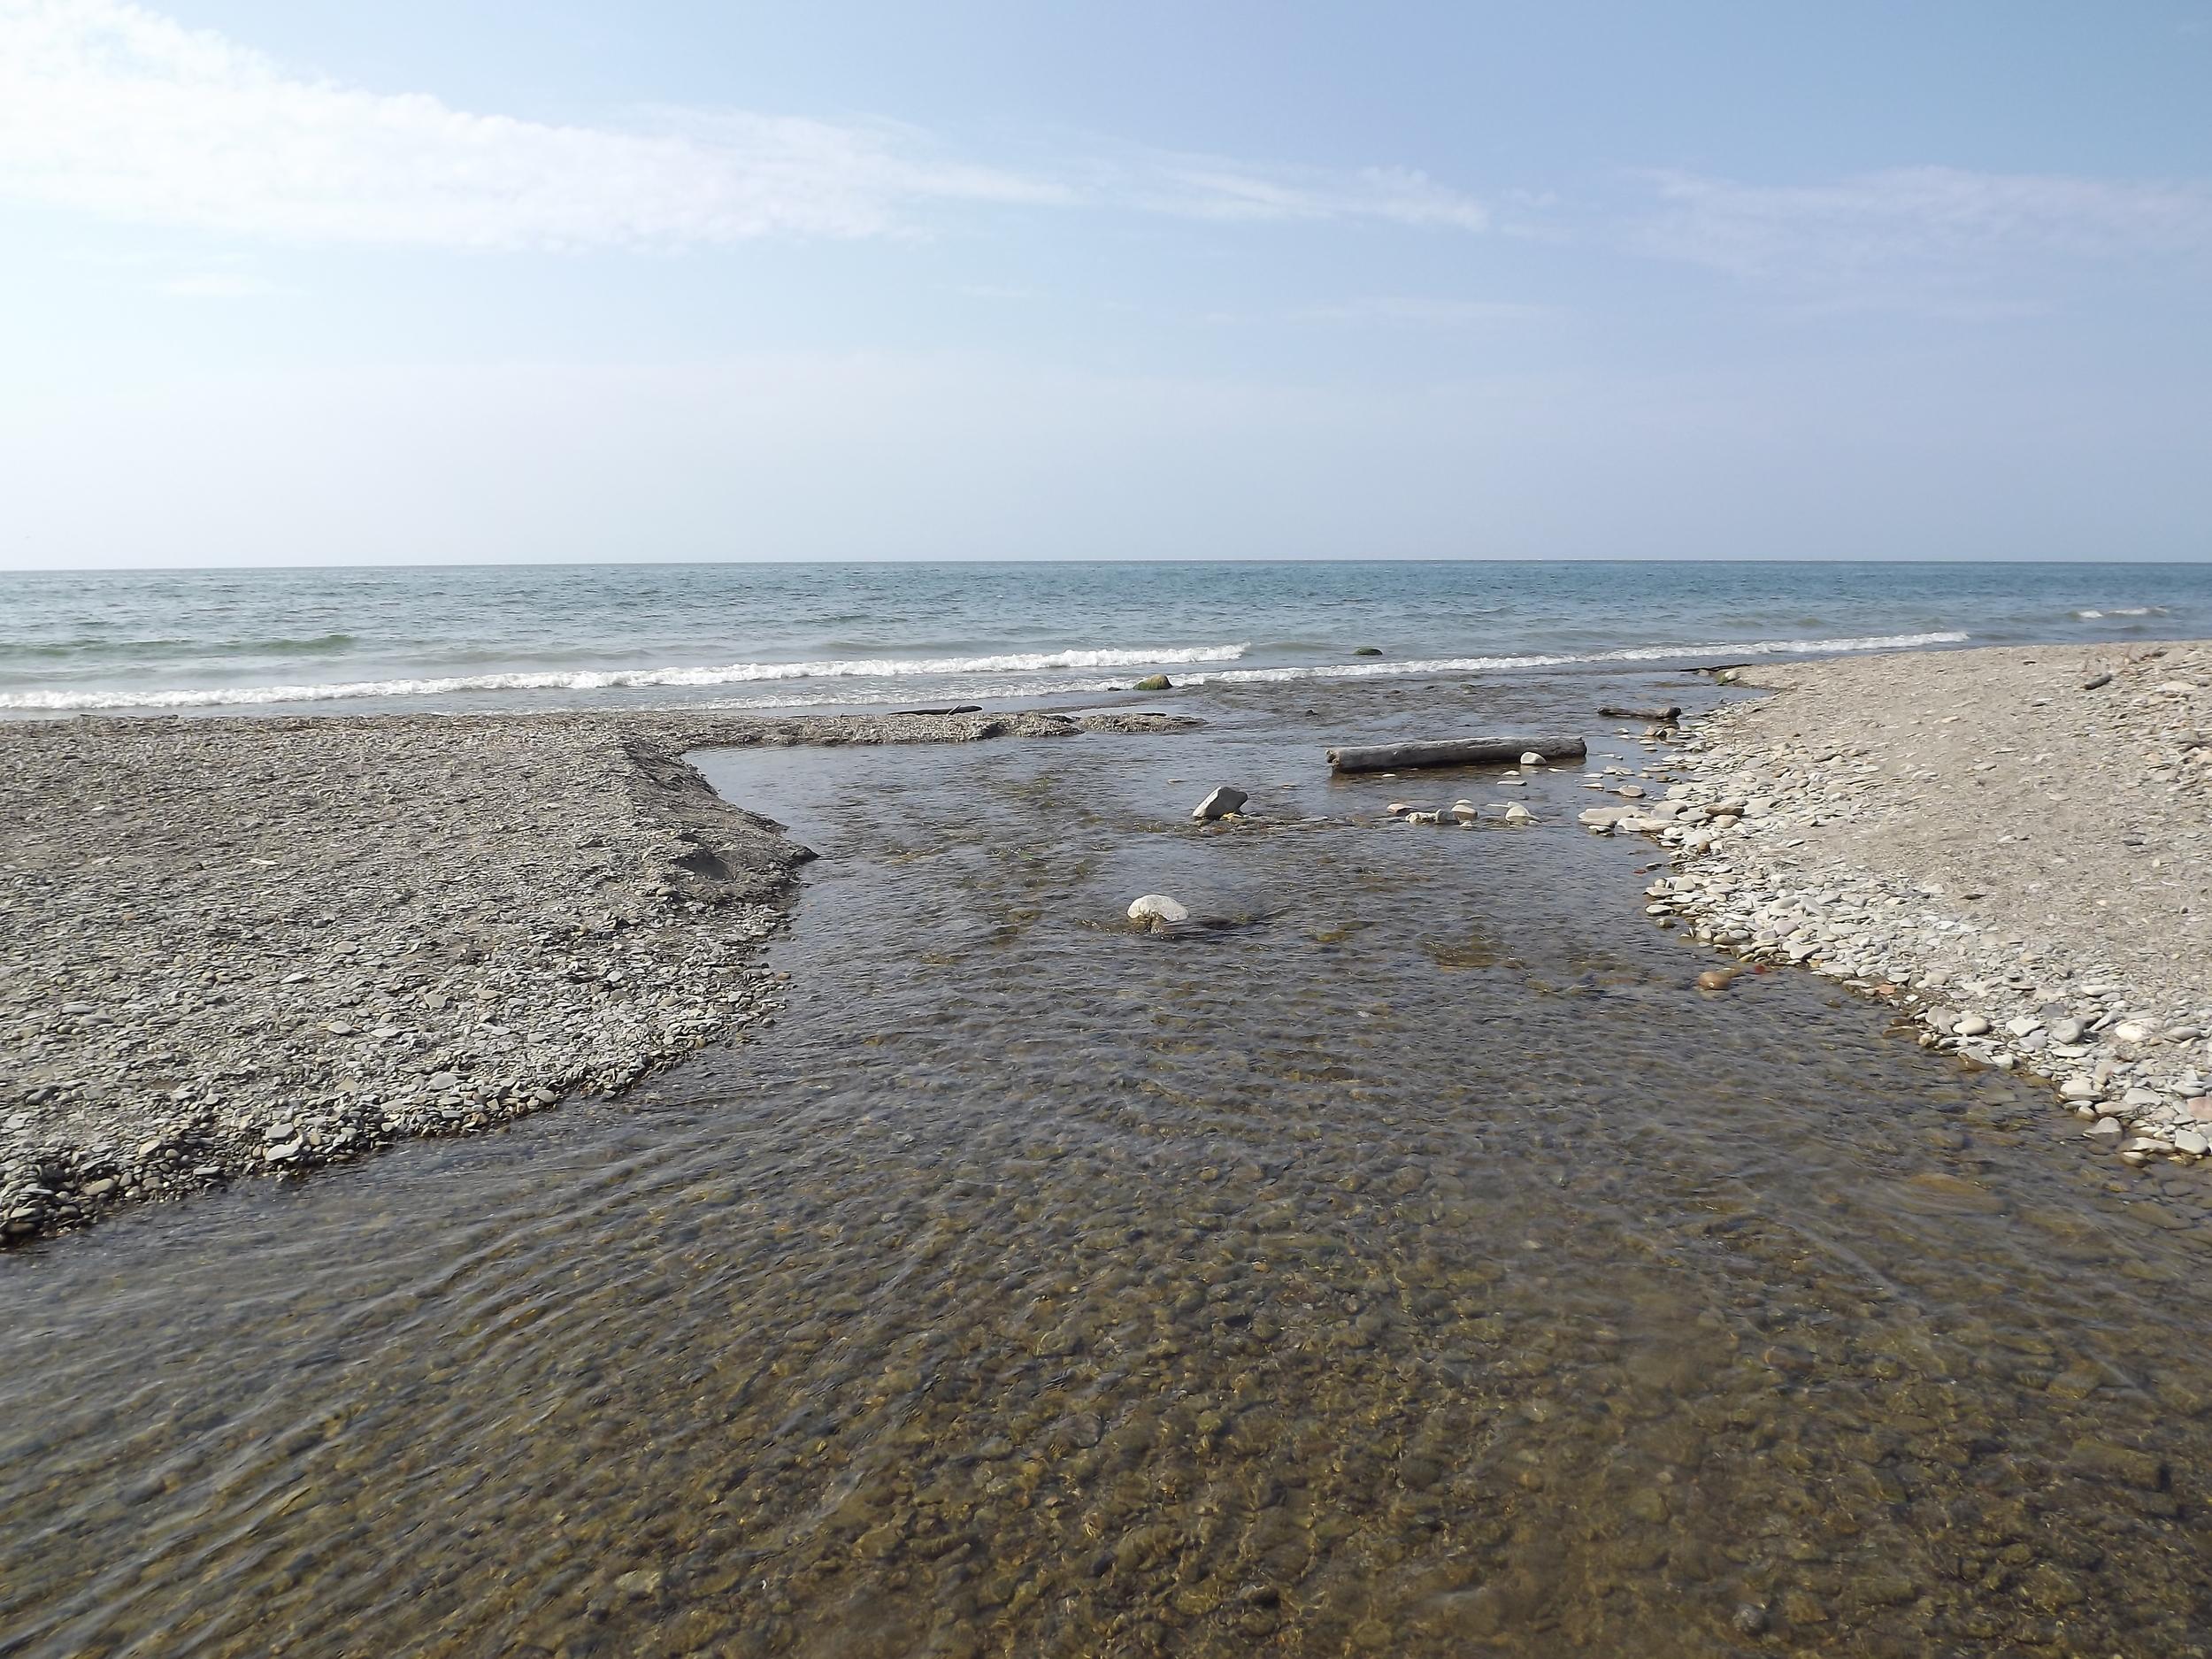 The Mouth of Chautauqua Creek on Lake Erie